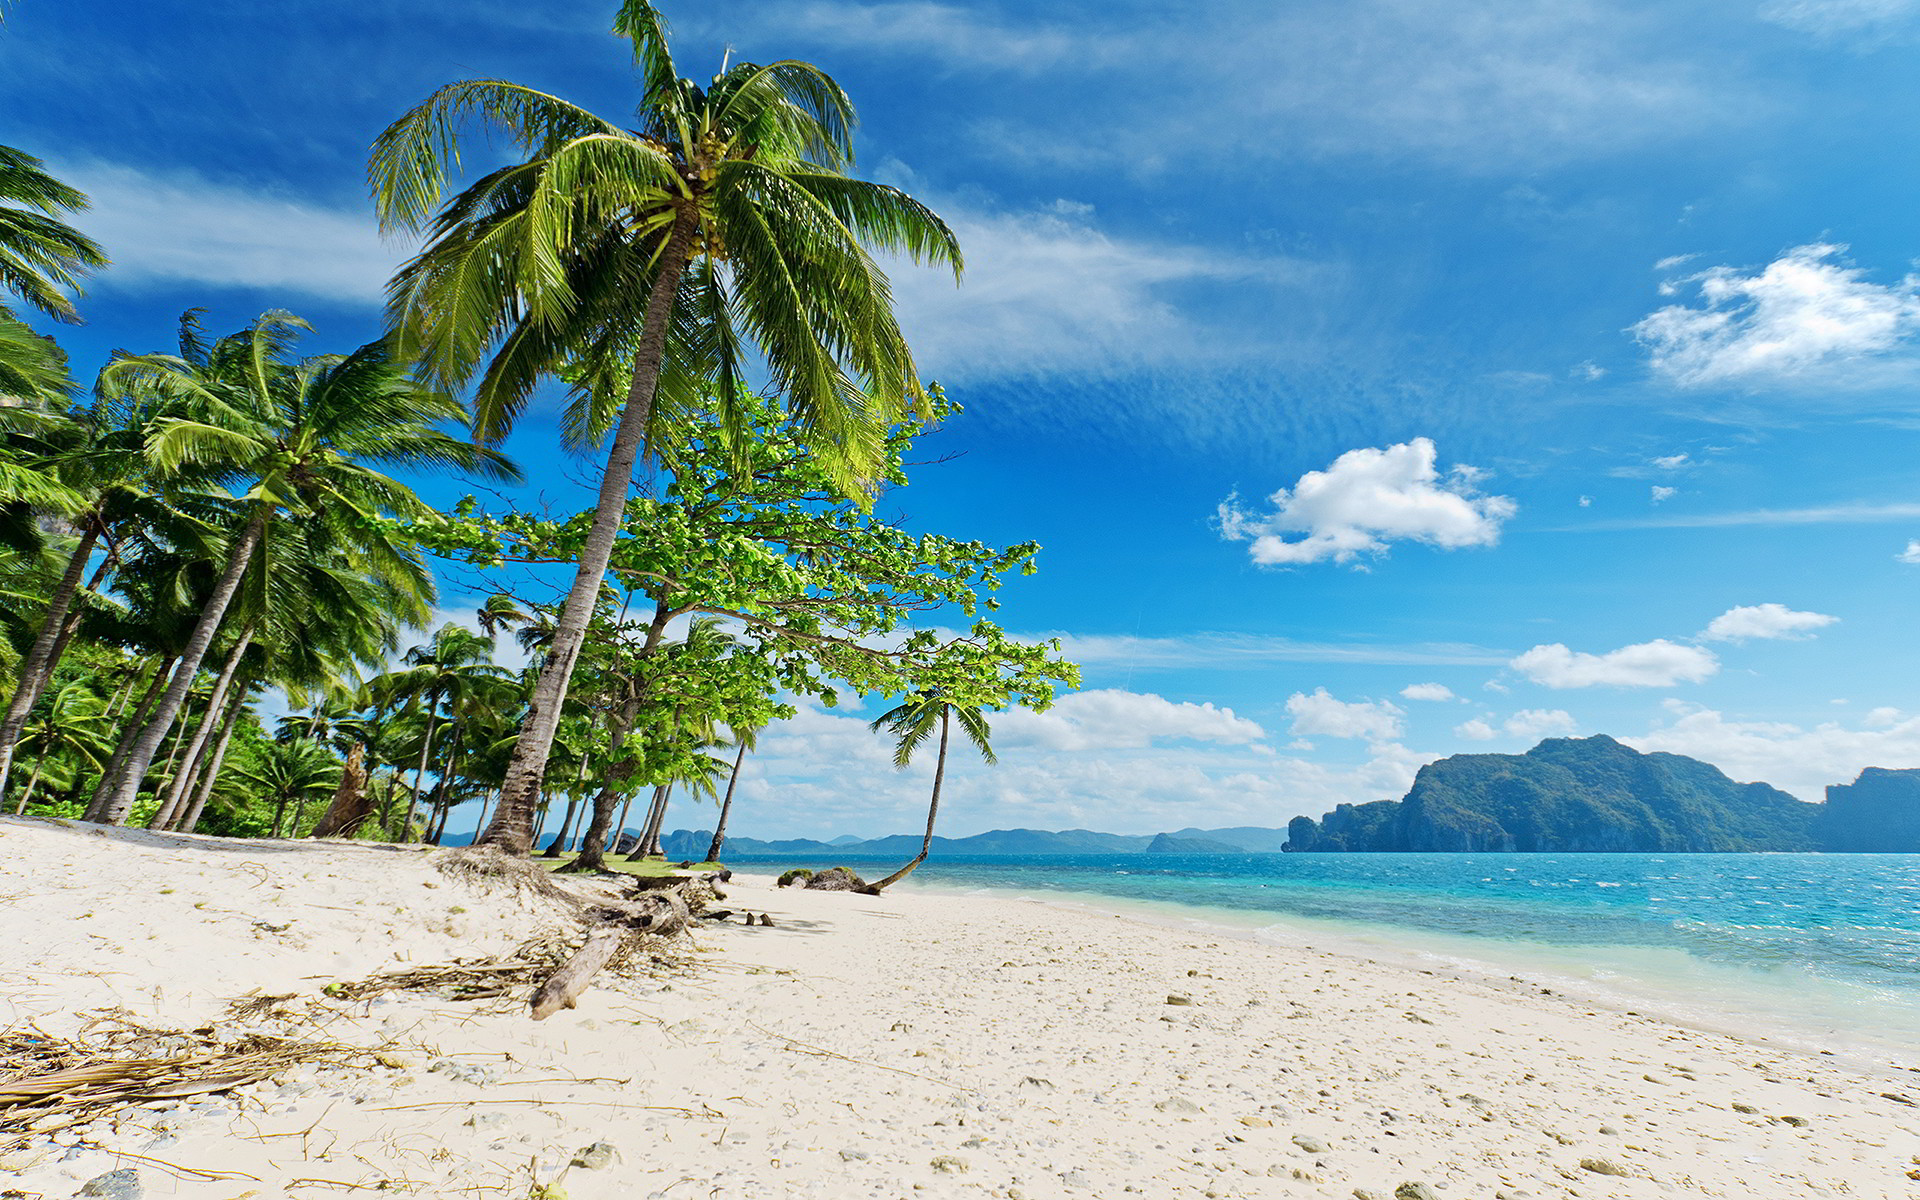 Tropical Beach Desktop Wallpaper ·① WallpaperTag